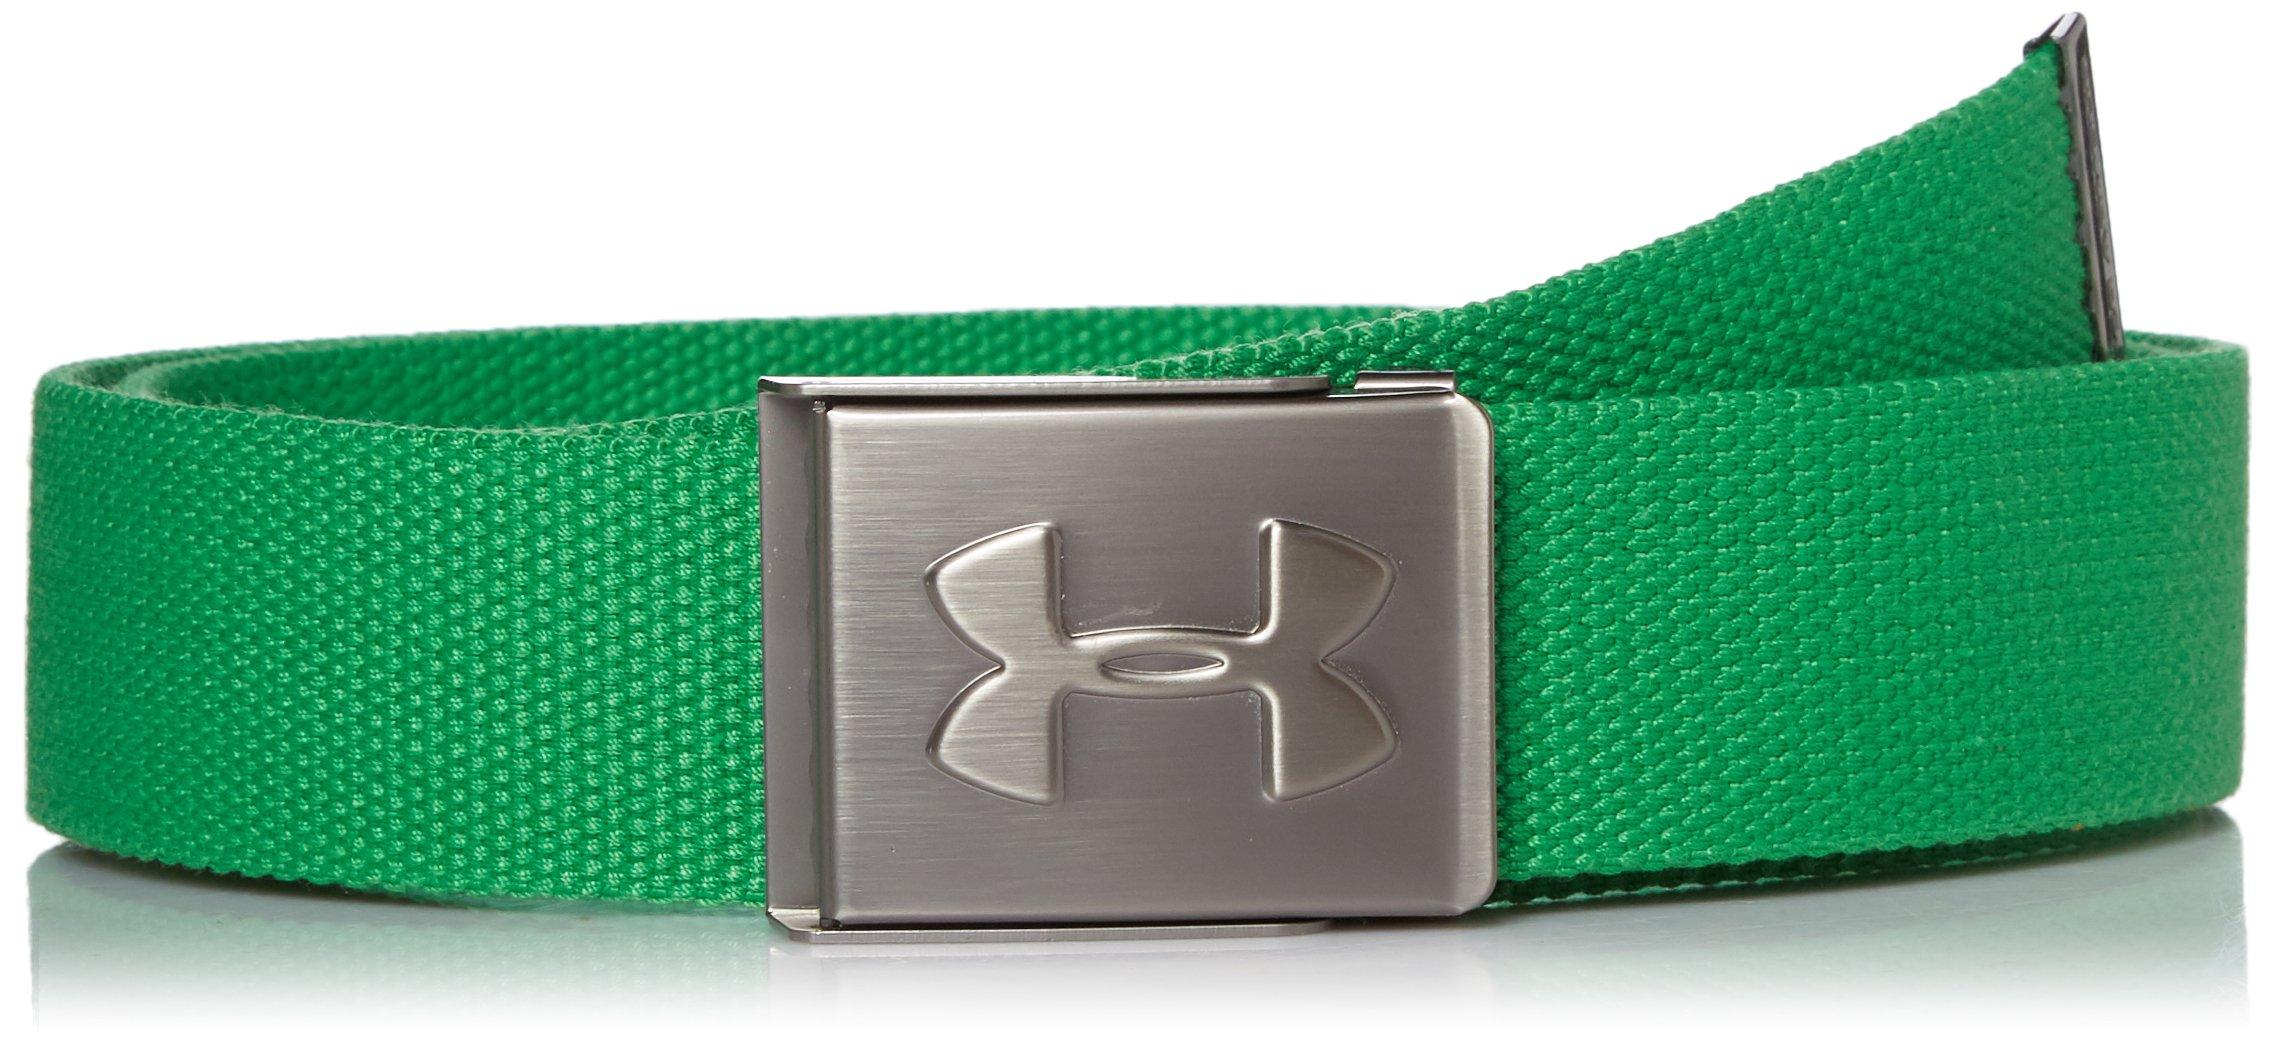 Under Armour Golf Men's Webbed Belt (Putting Green) by Under Armour